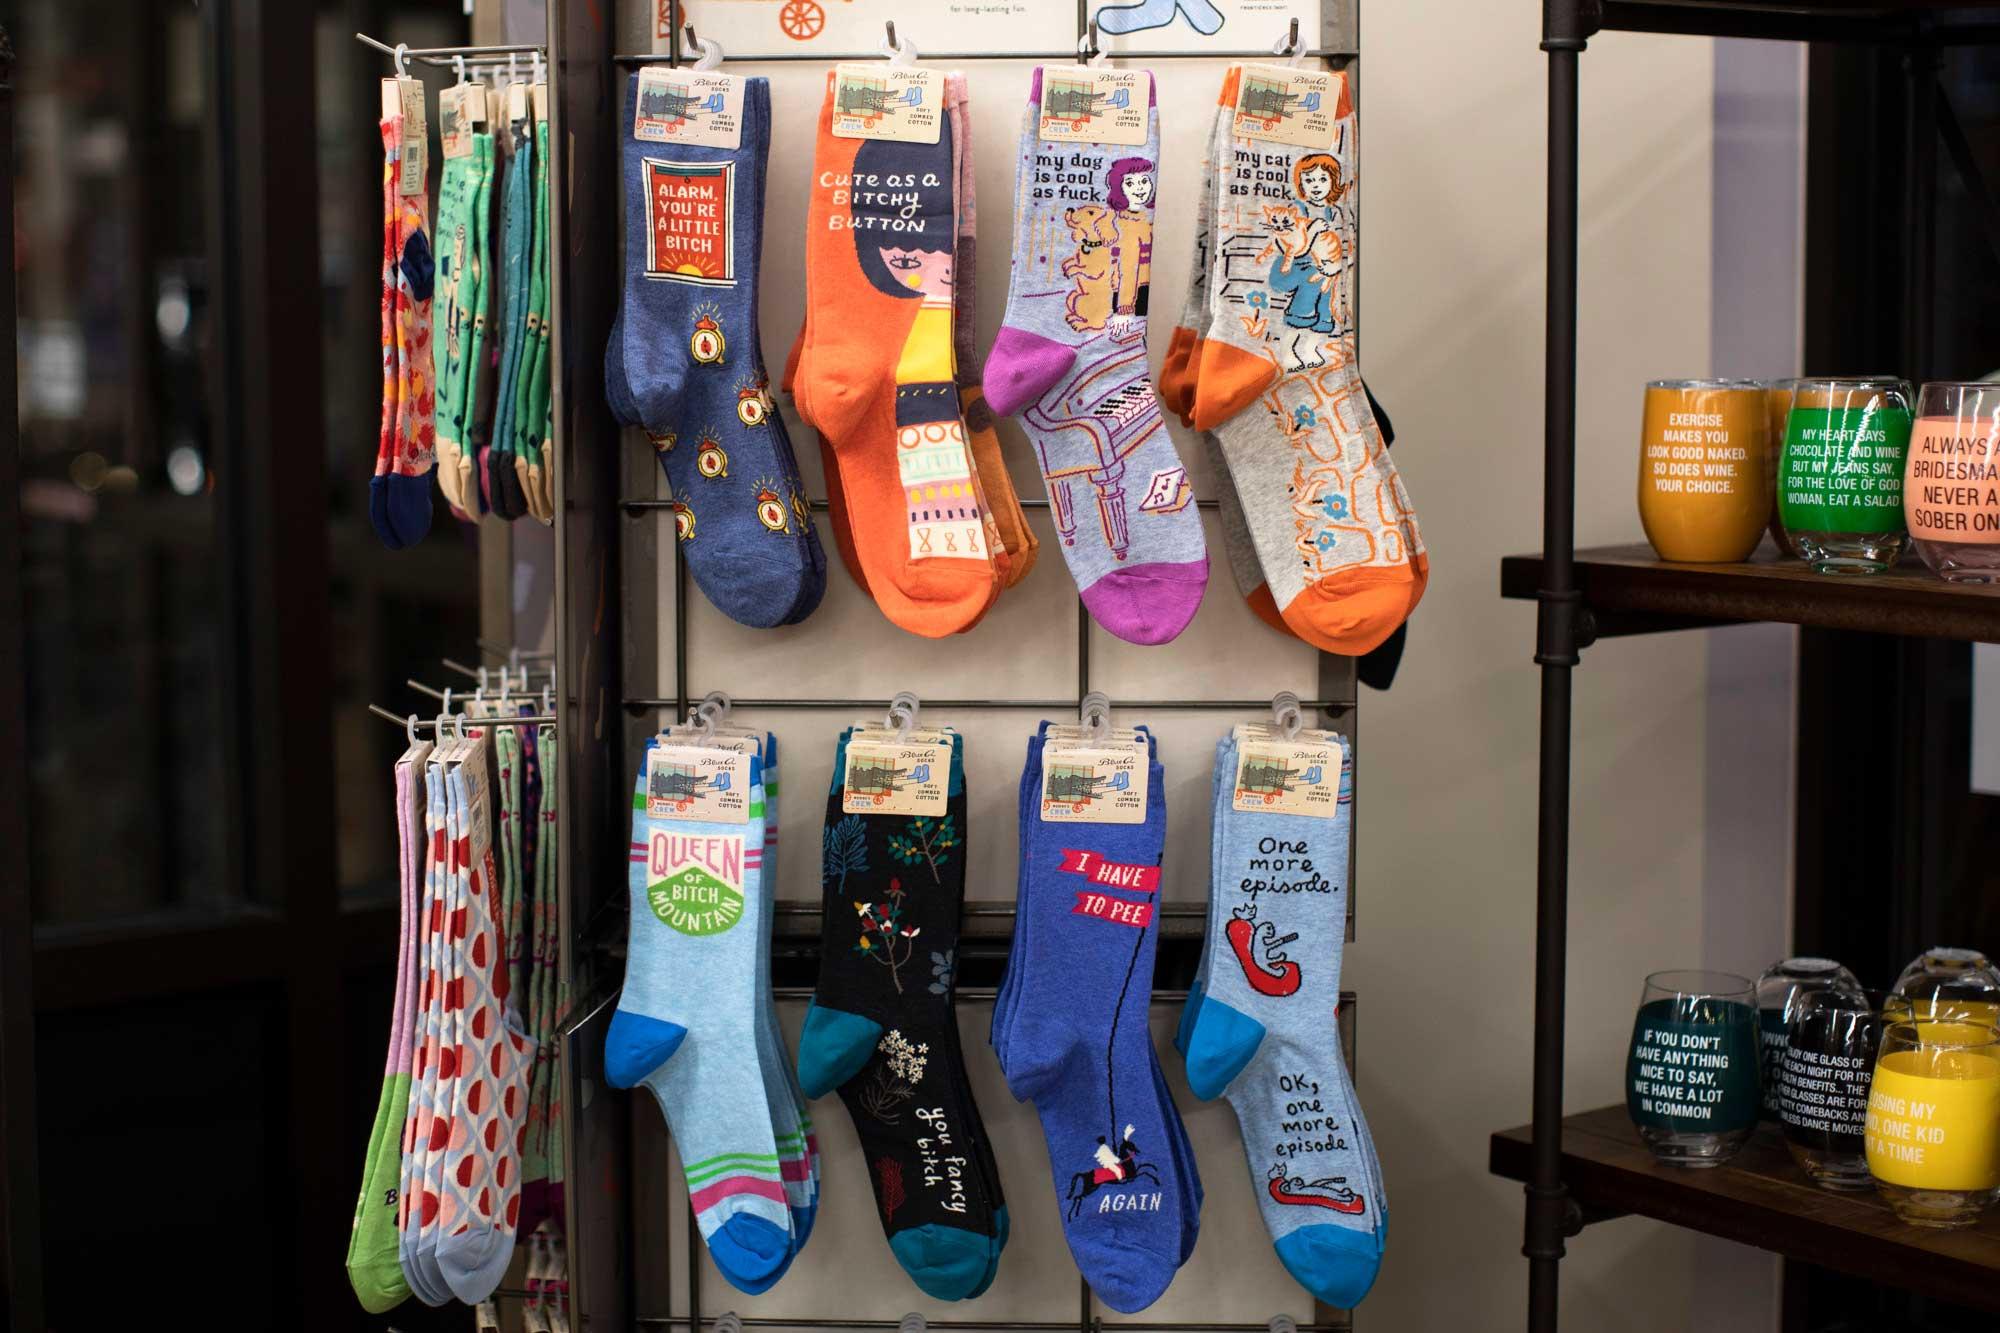 Blue Q socks on a rack